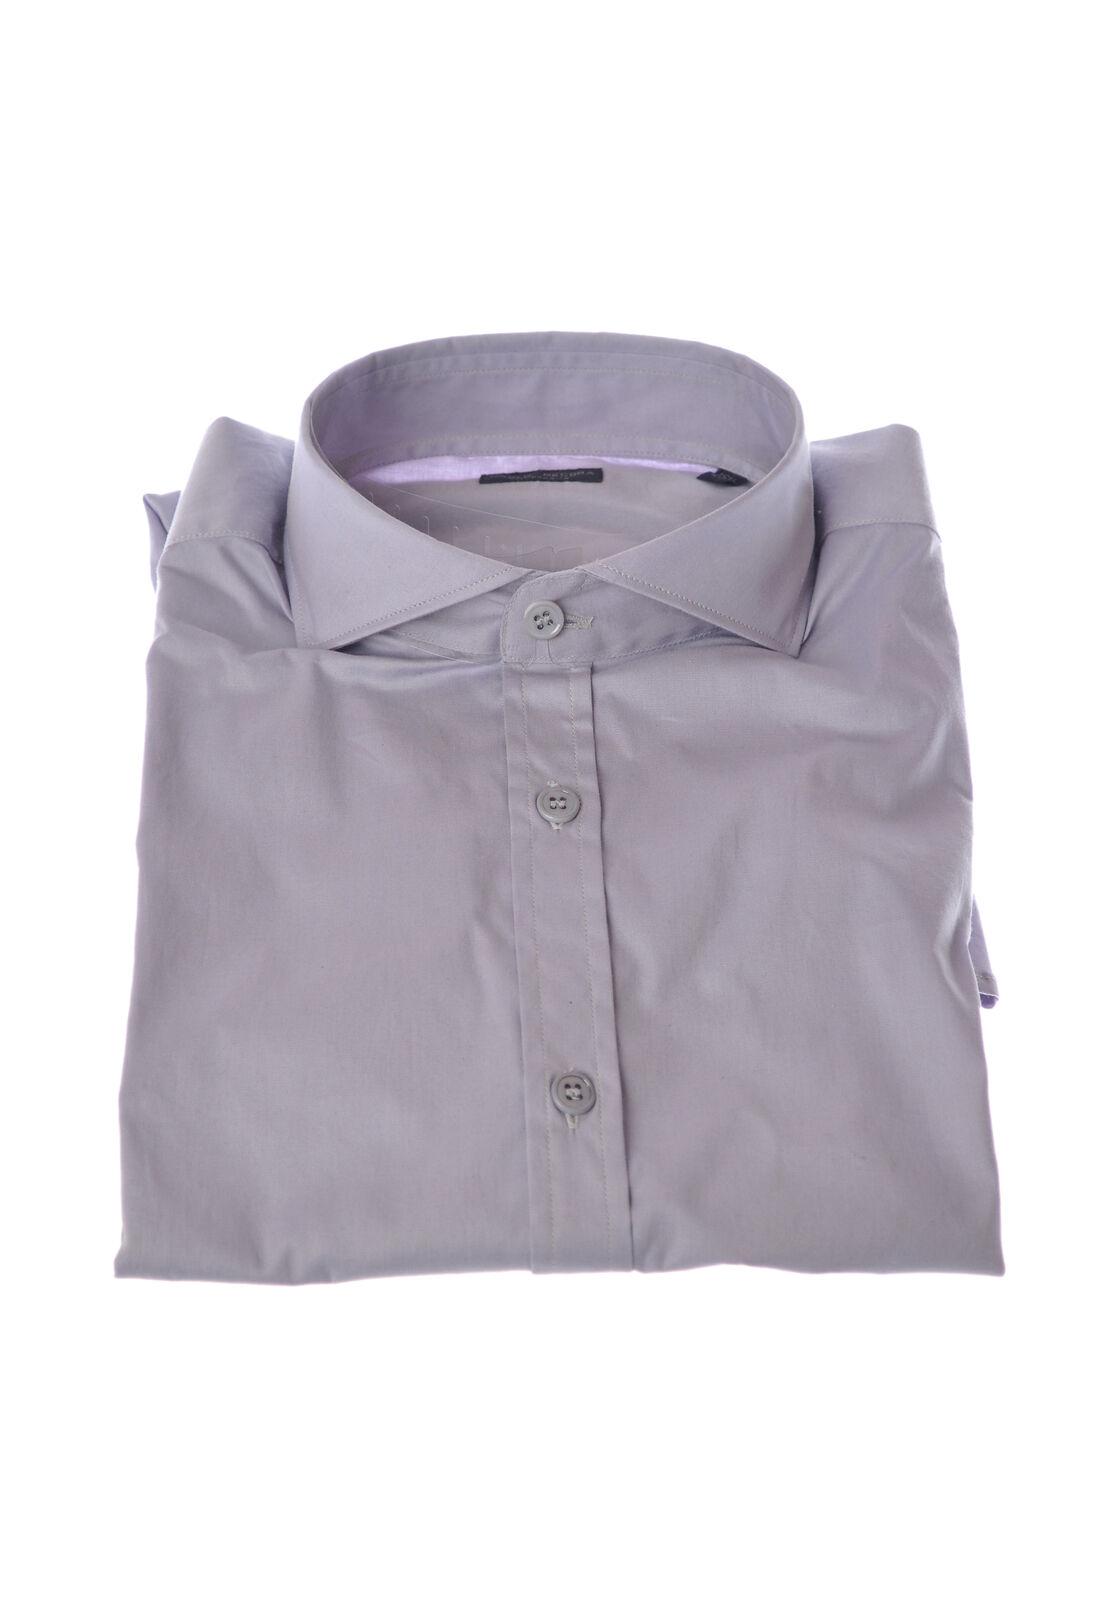 Paolo Pecora - Shirts-Shirt - Man - Grau - 3000706C183735